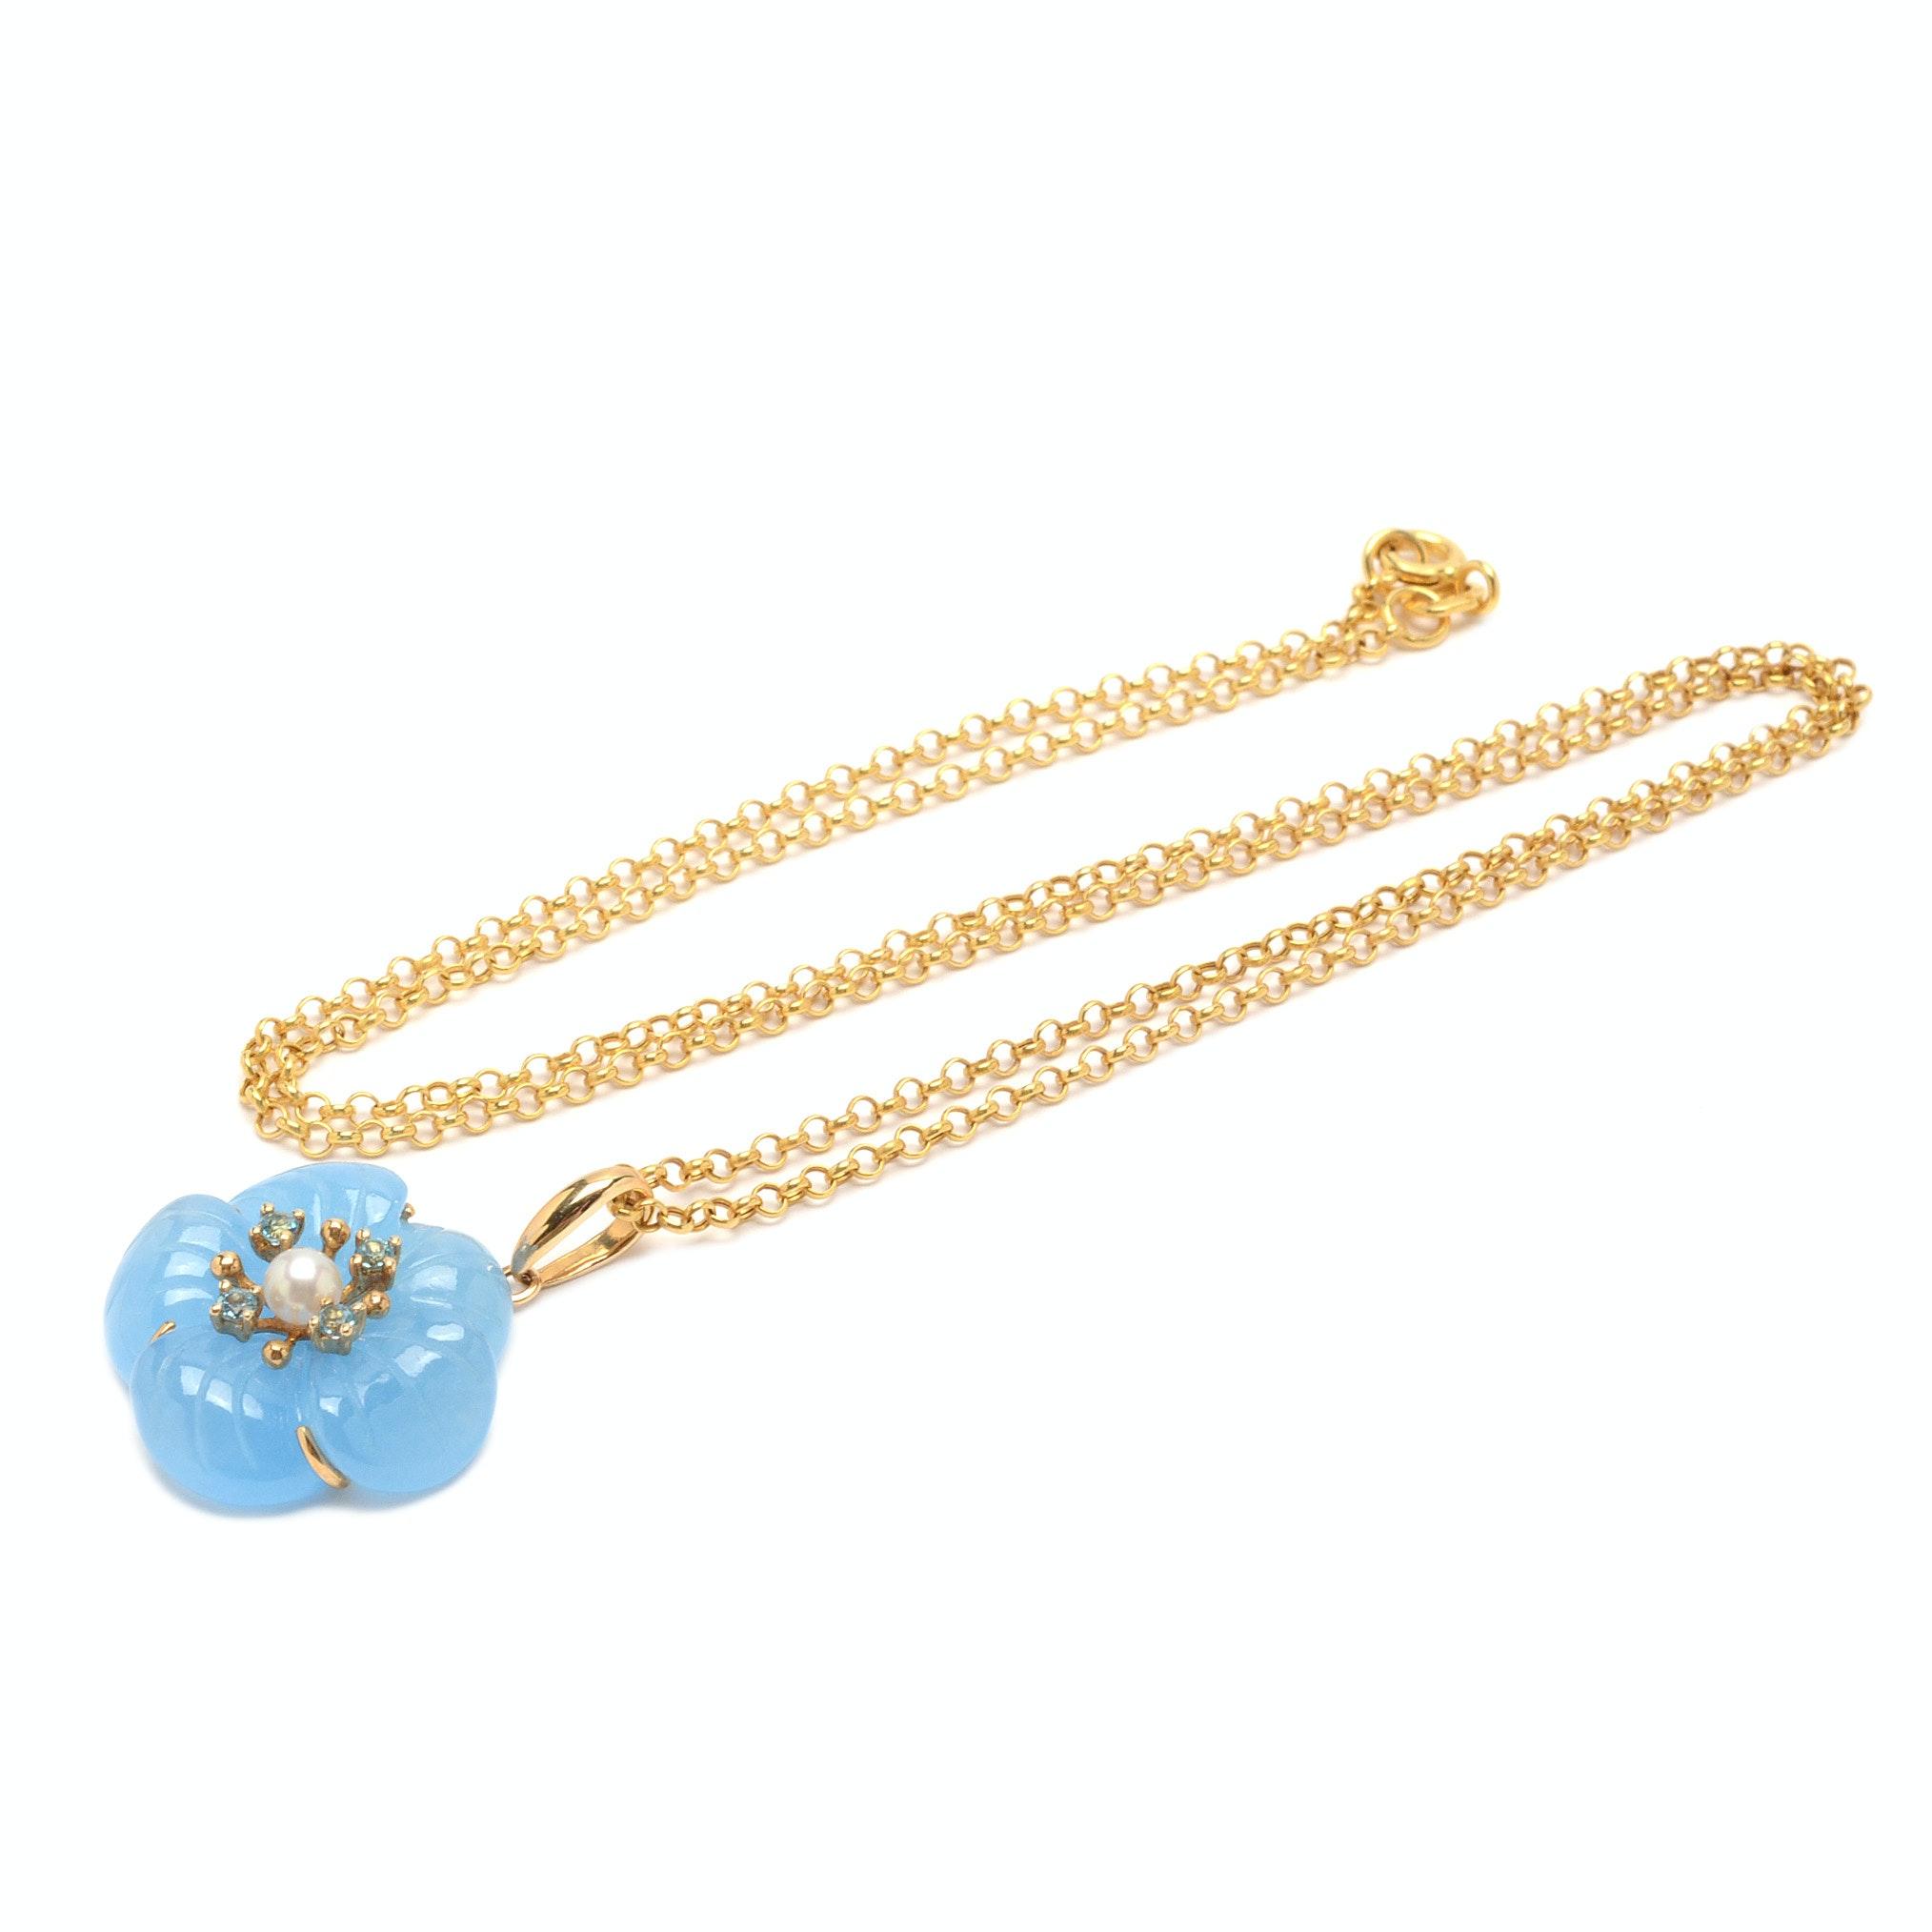 14K Yellow Gold Gemstone Flower Pendant Necklace